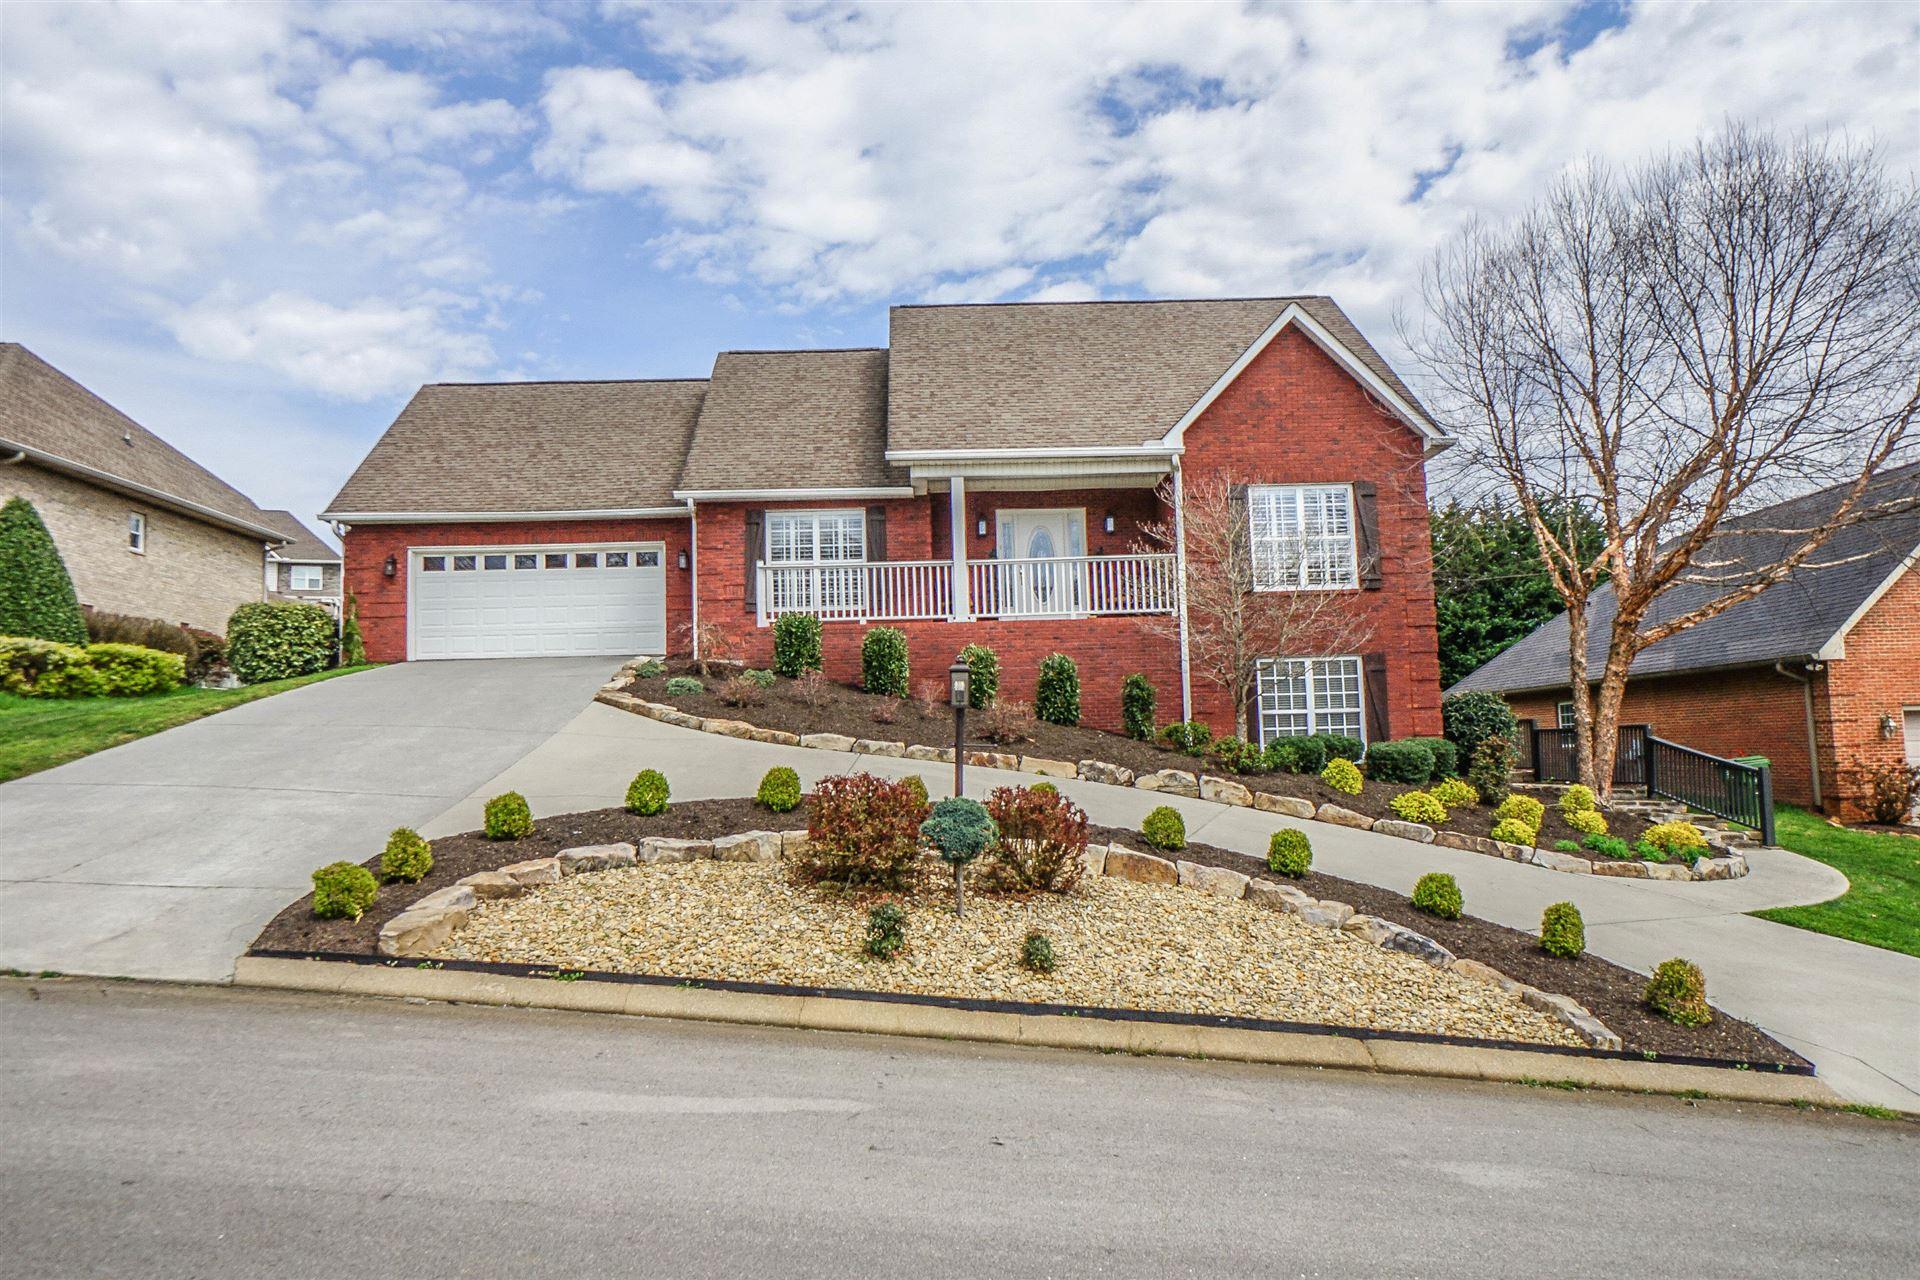 Photo of 424 Royal Oaks Drive, Maryville, TN 37801 (MLS # 1147458)